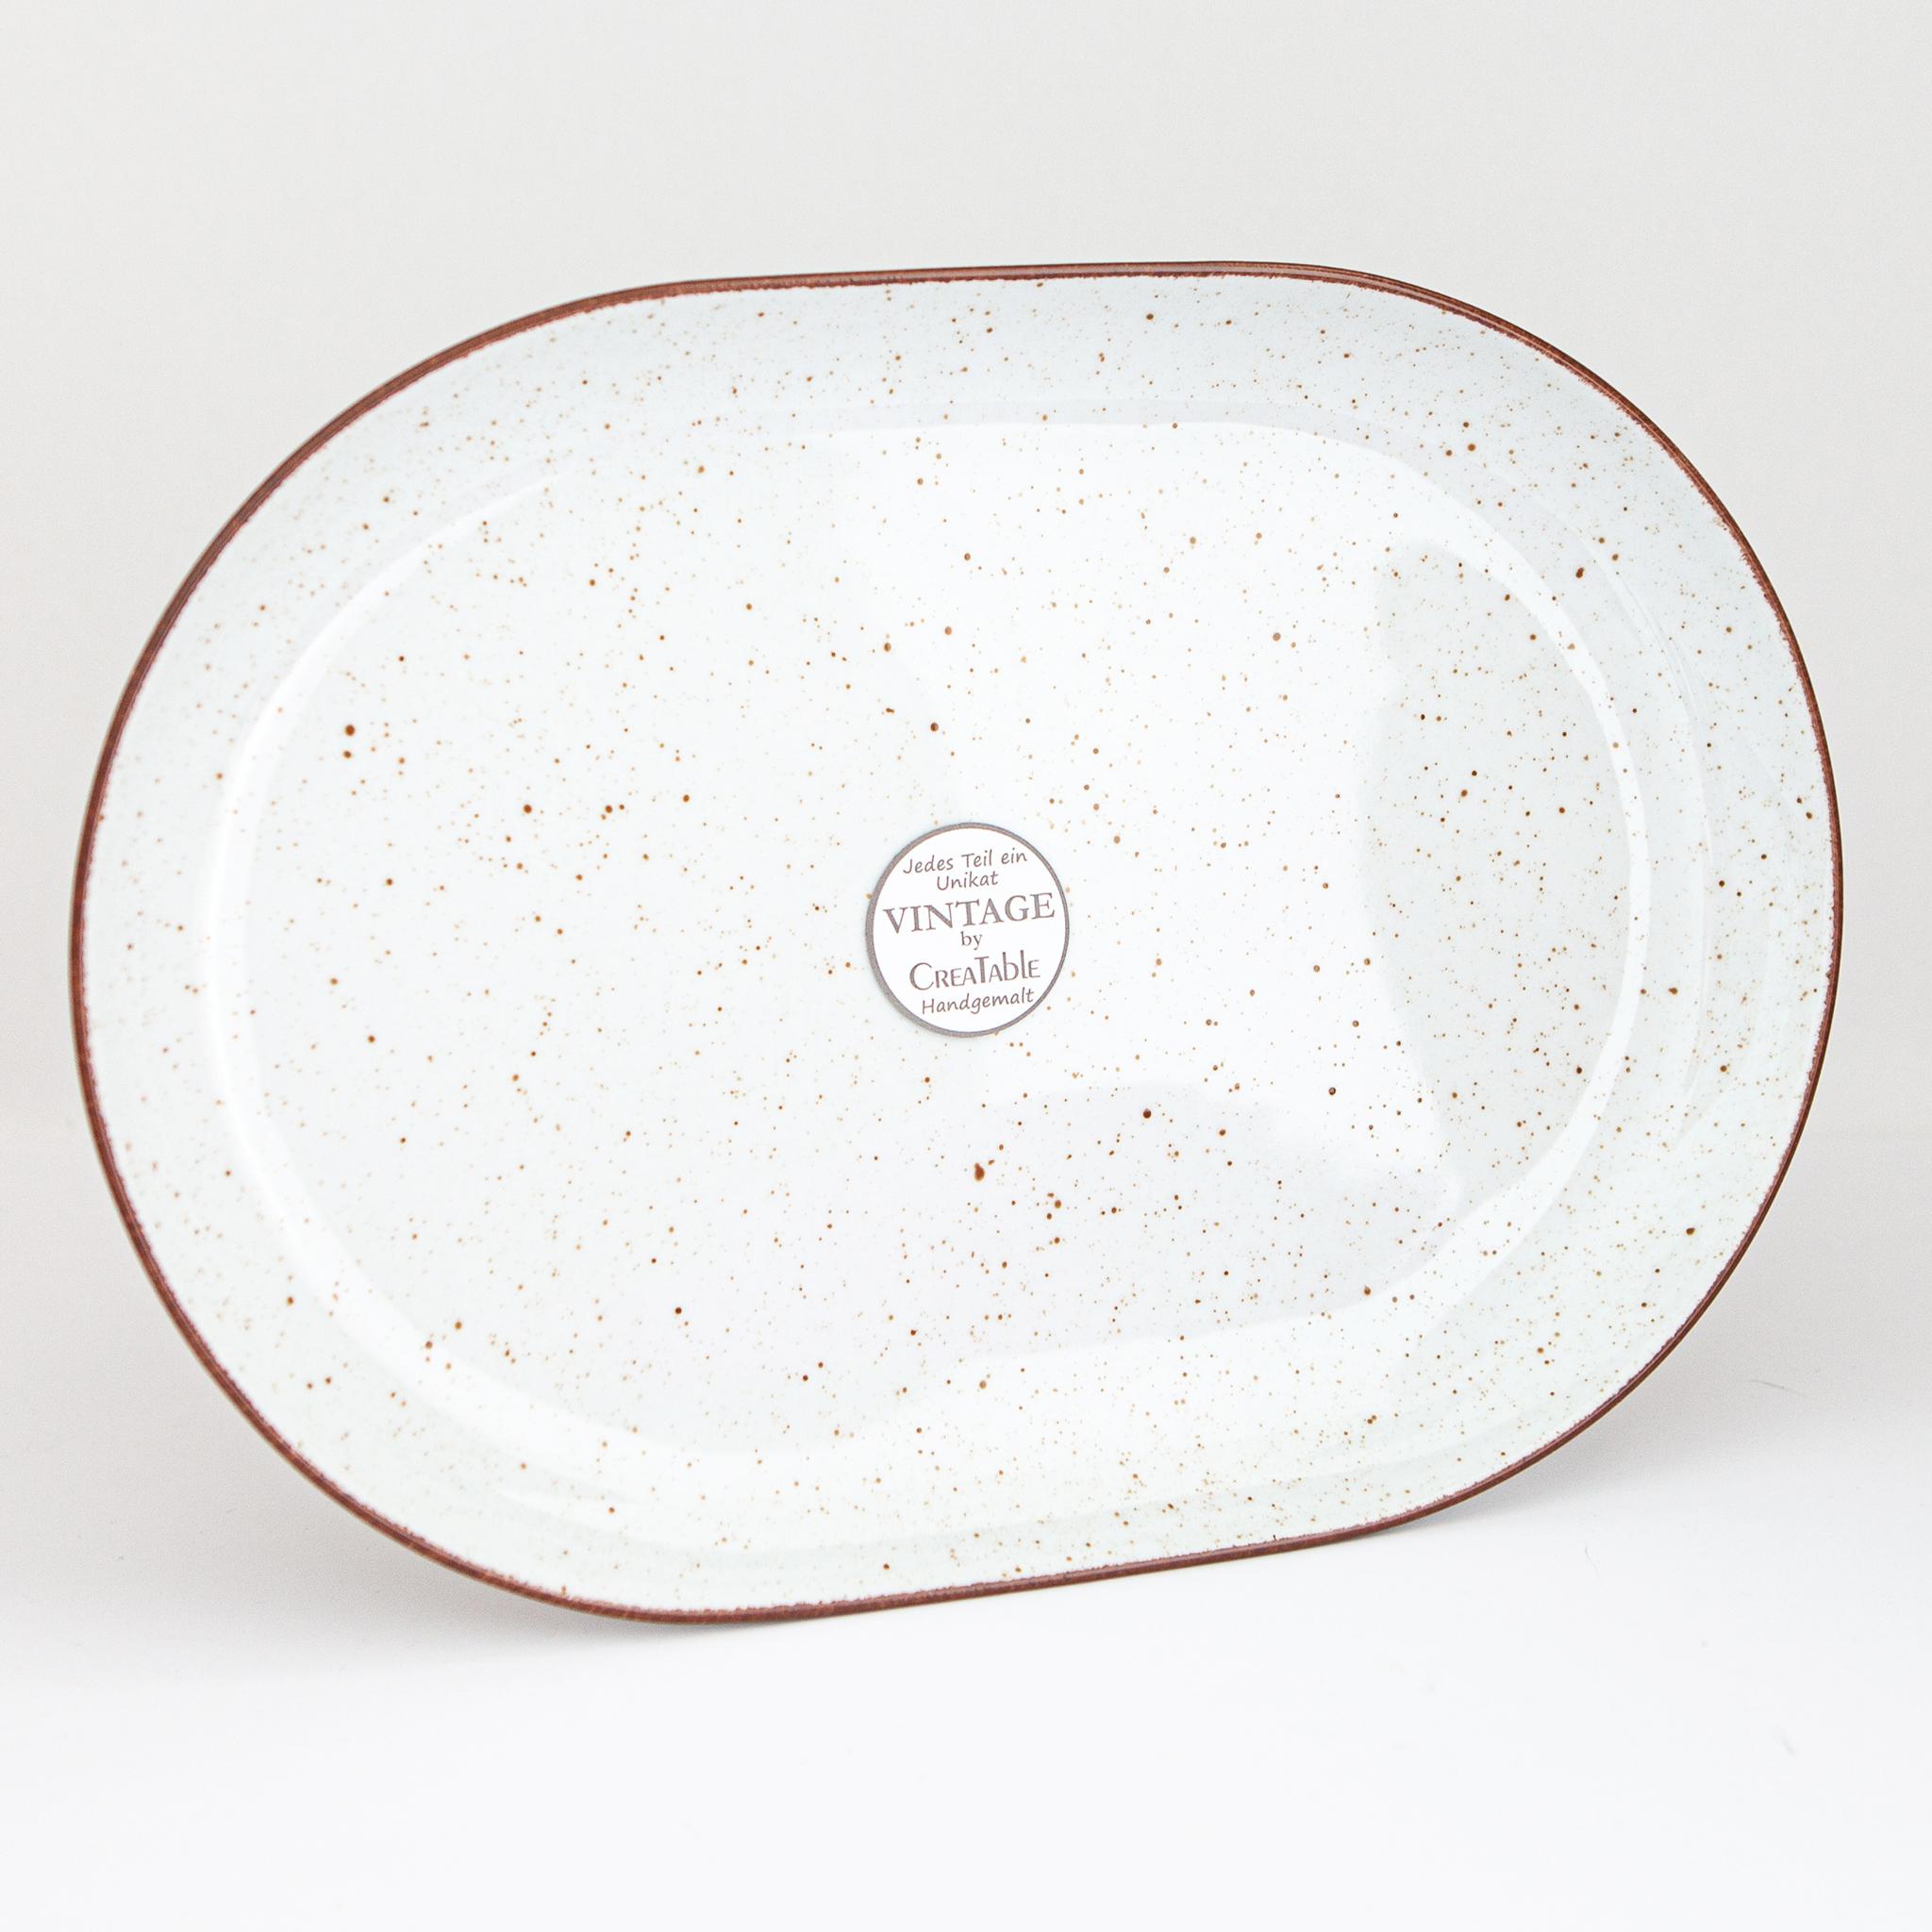 Creatable Platte Vintage Nature Geschirr Porzellan